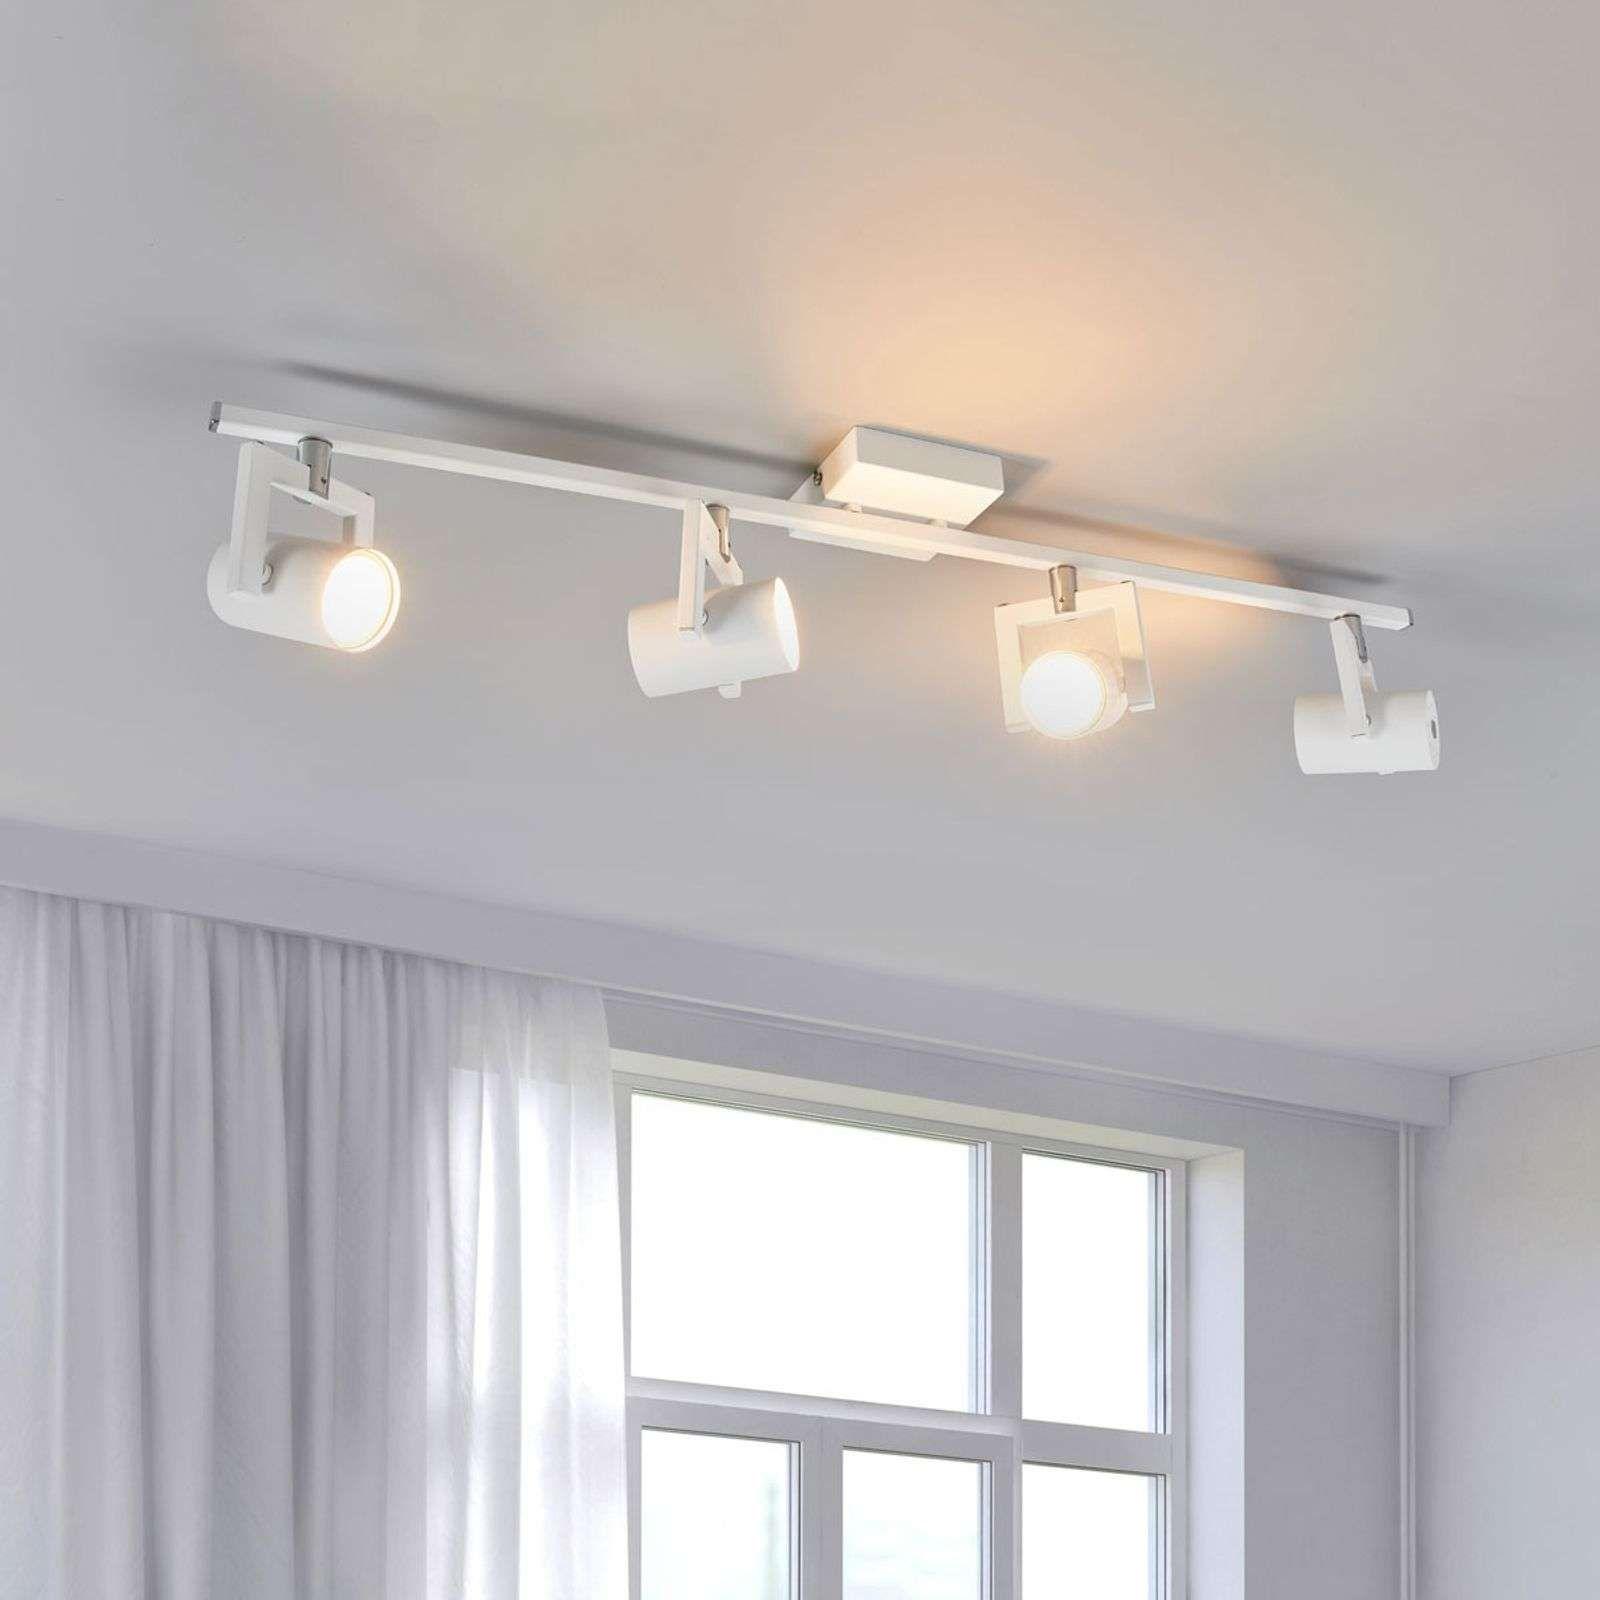 Plafonnier Led Sulamita Blanc 4 Lampes En 2020 Plafonnier Led Eclairage Plafond Et Plafonnier